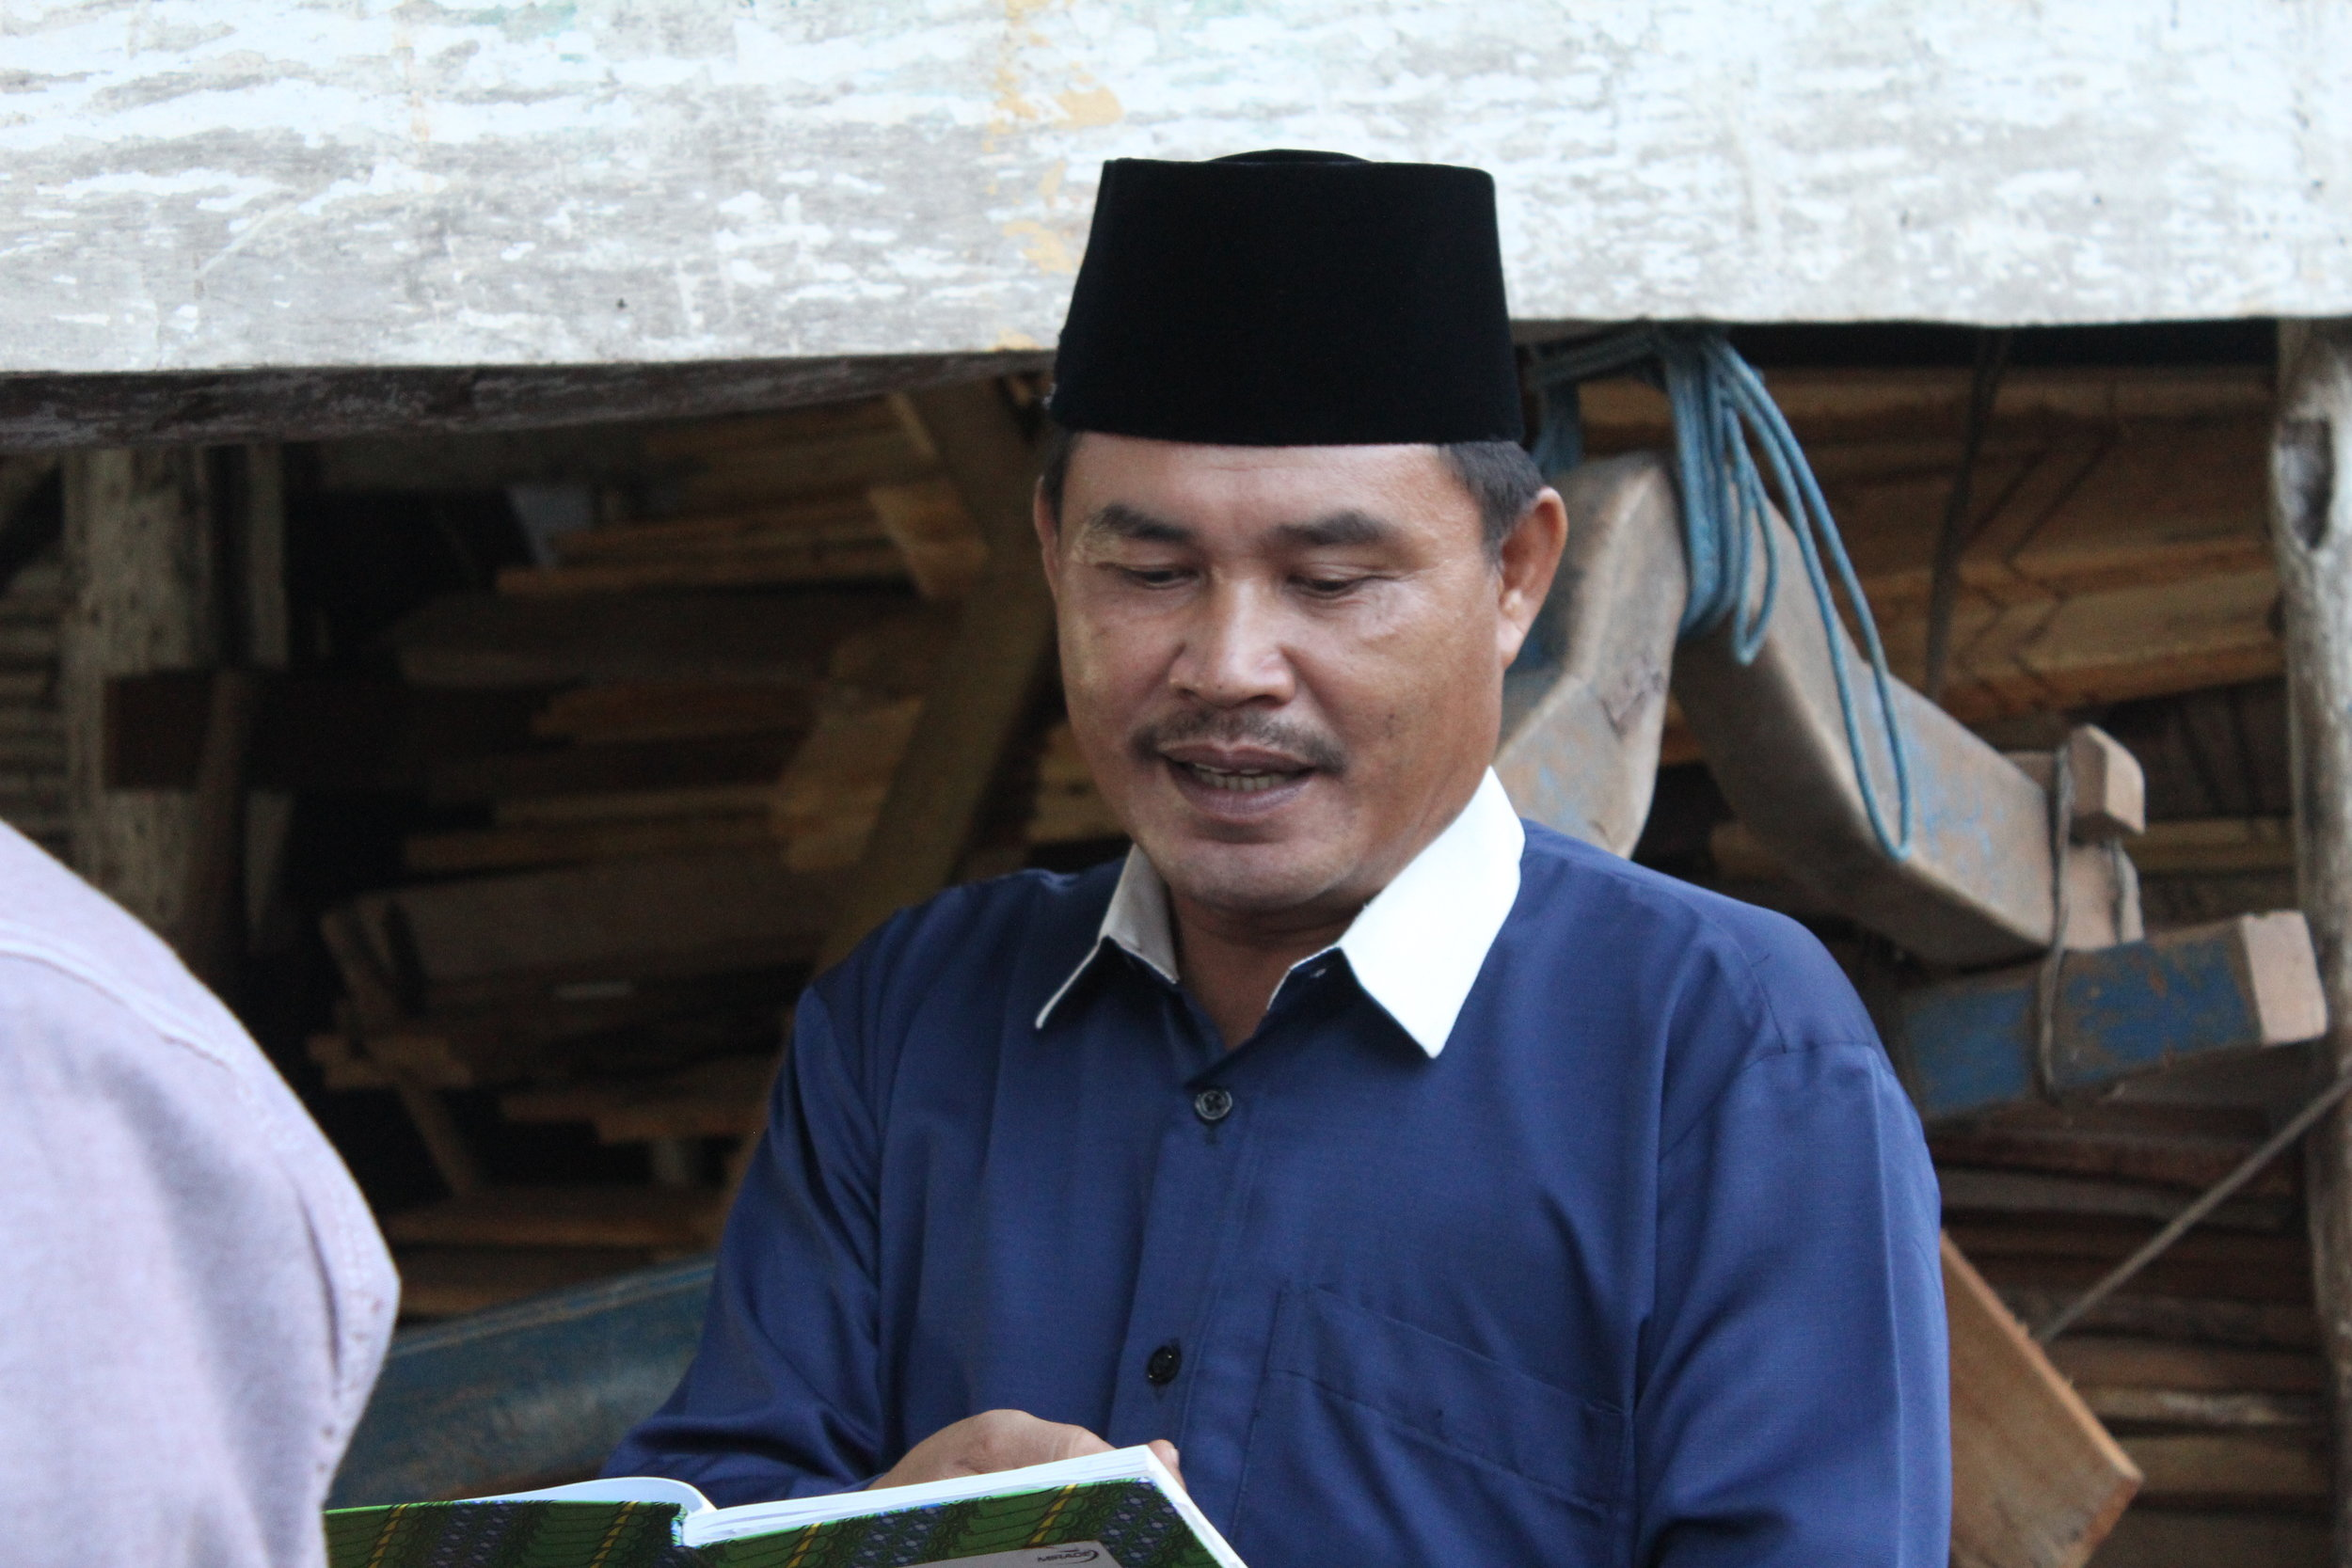 Pak Halidi Anwar introducing the group in Gunung Raya